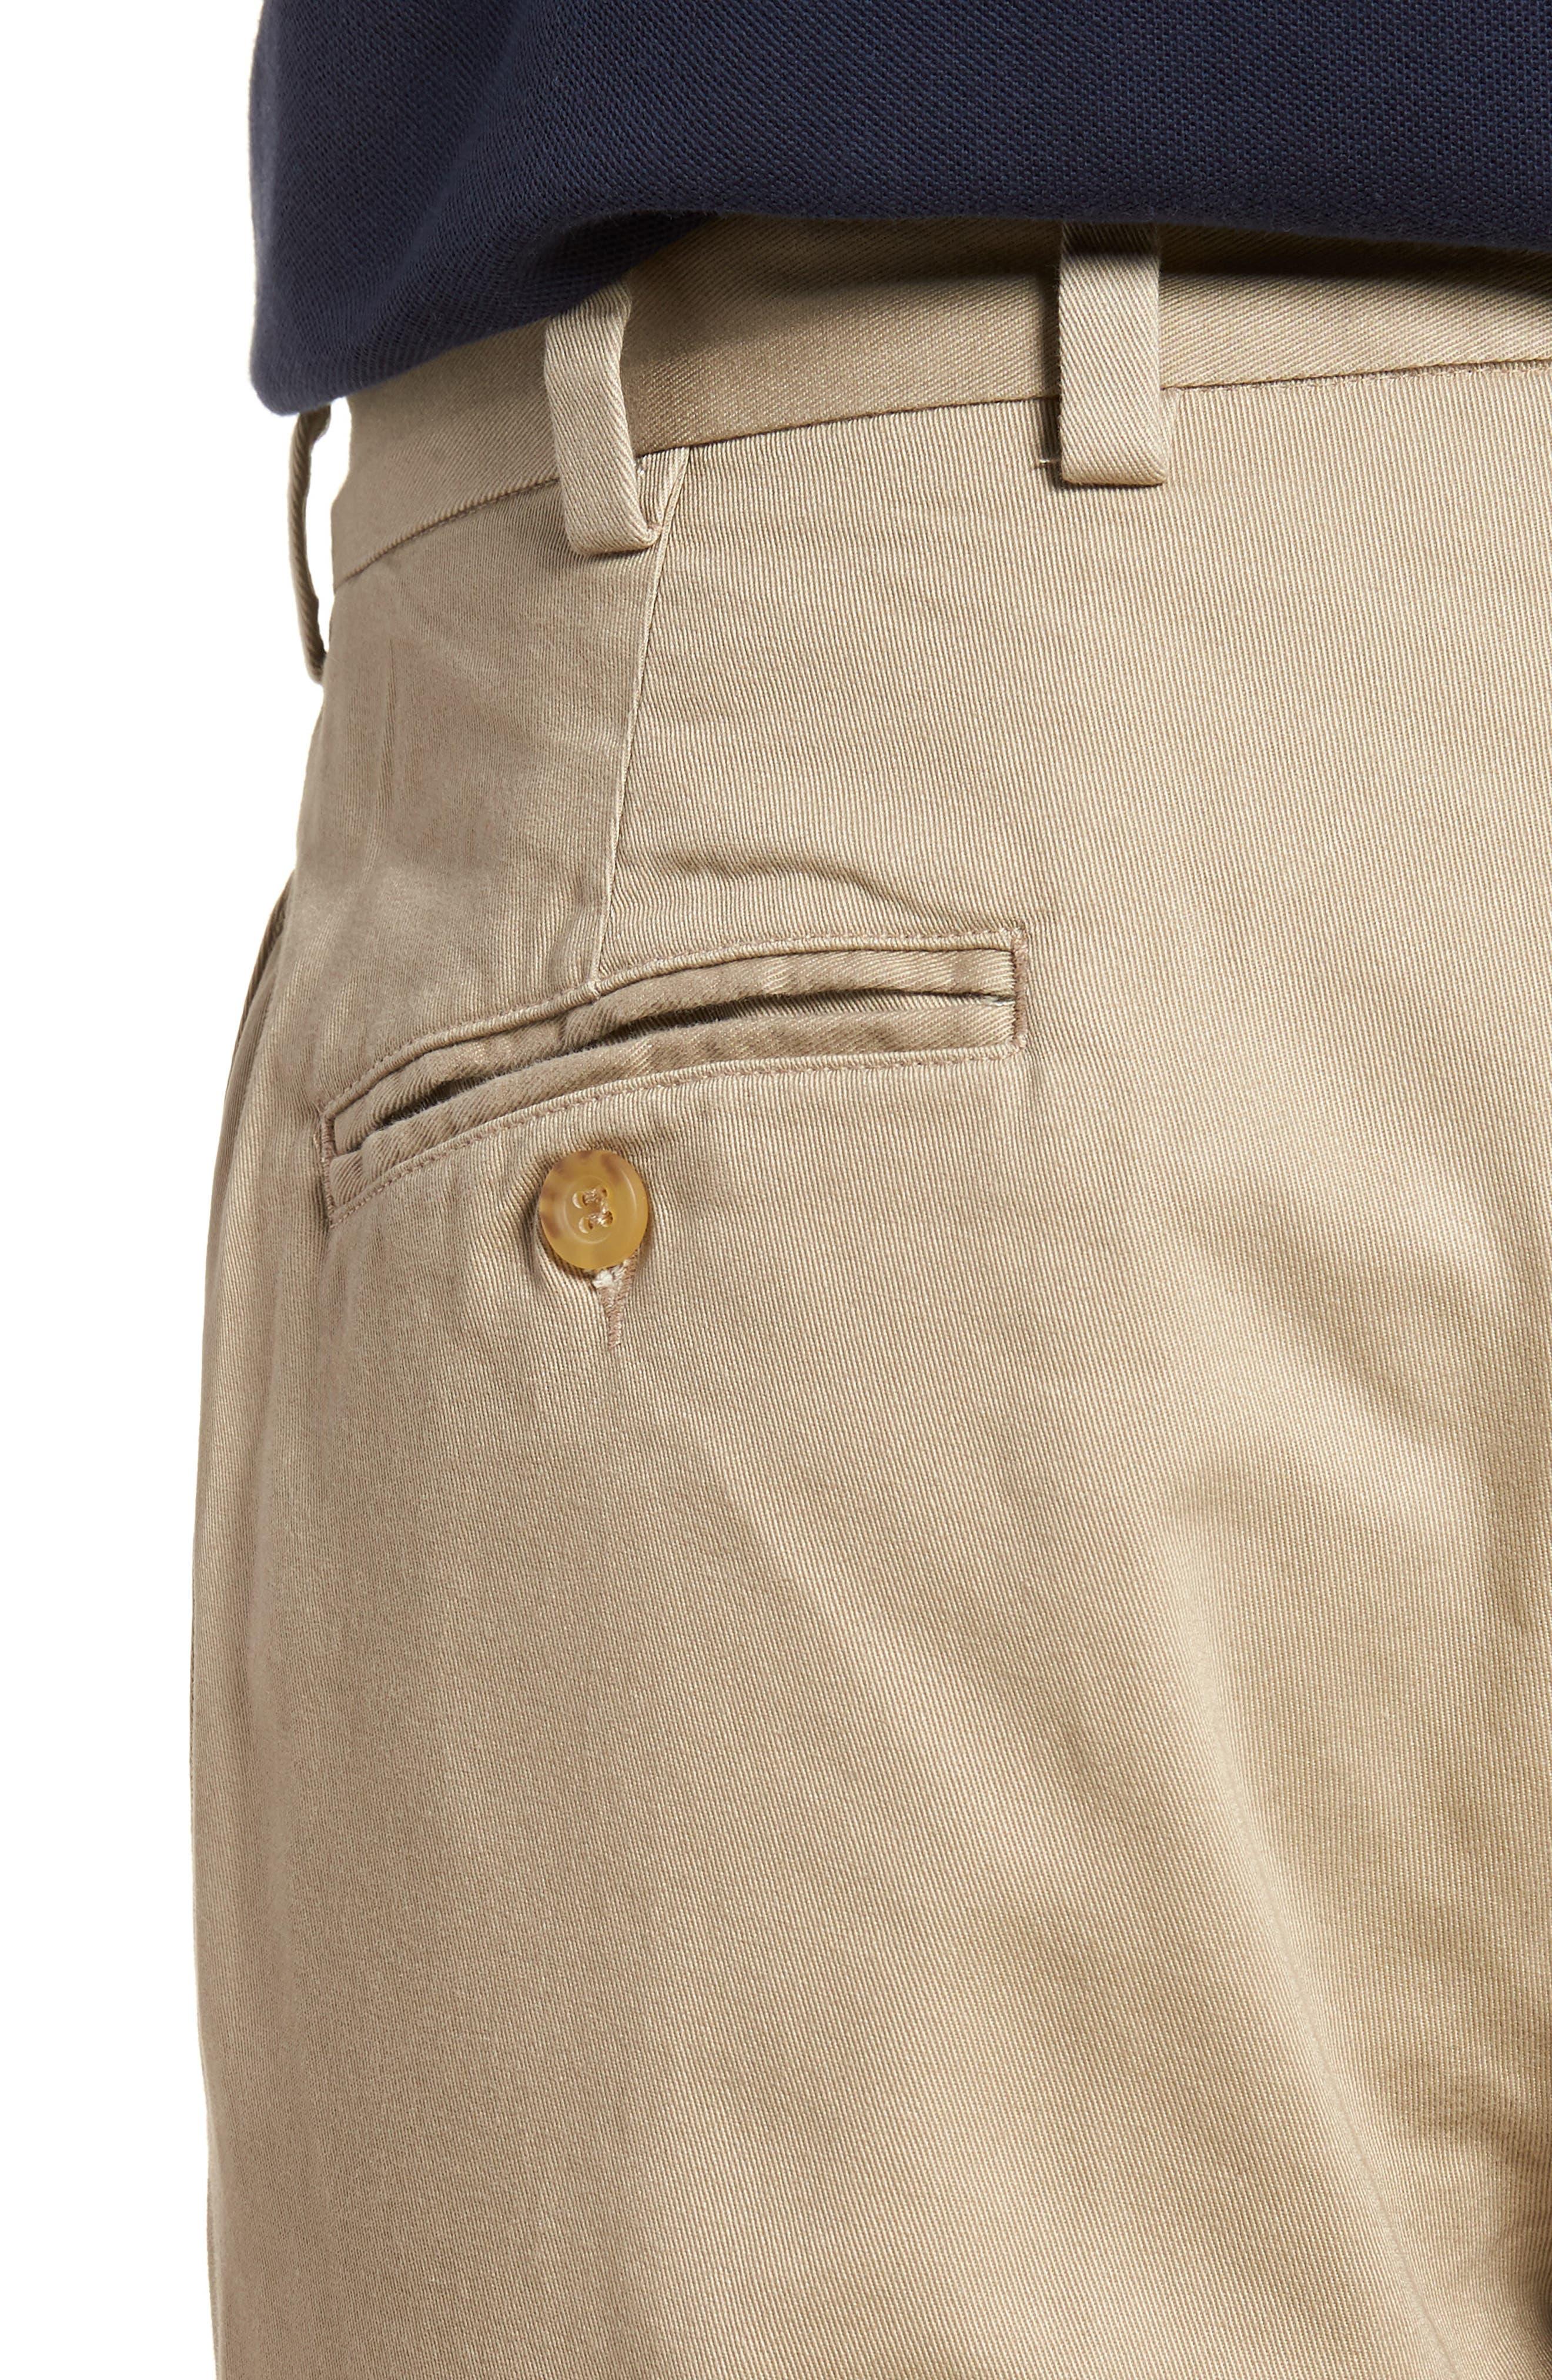 M2 Classic Fit Vintage Twill Flat Front Pants,                             Alternate thumbnail 4, color,                             Khaki